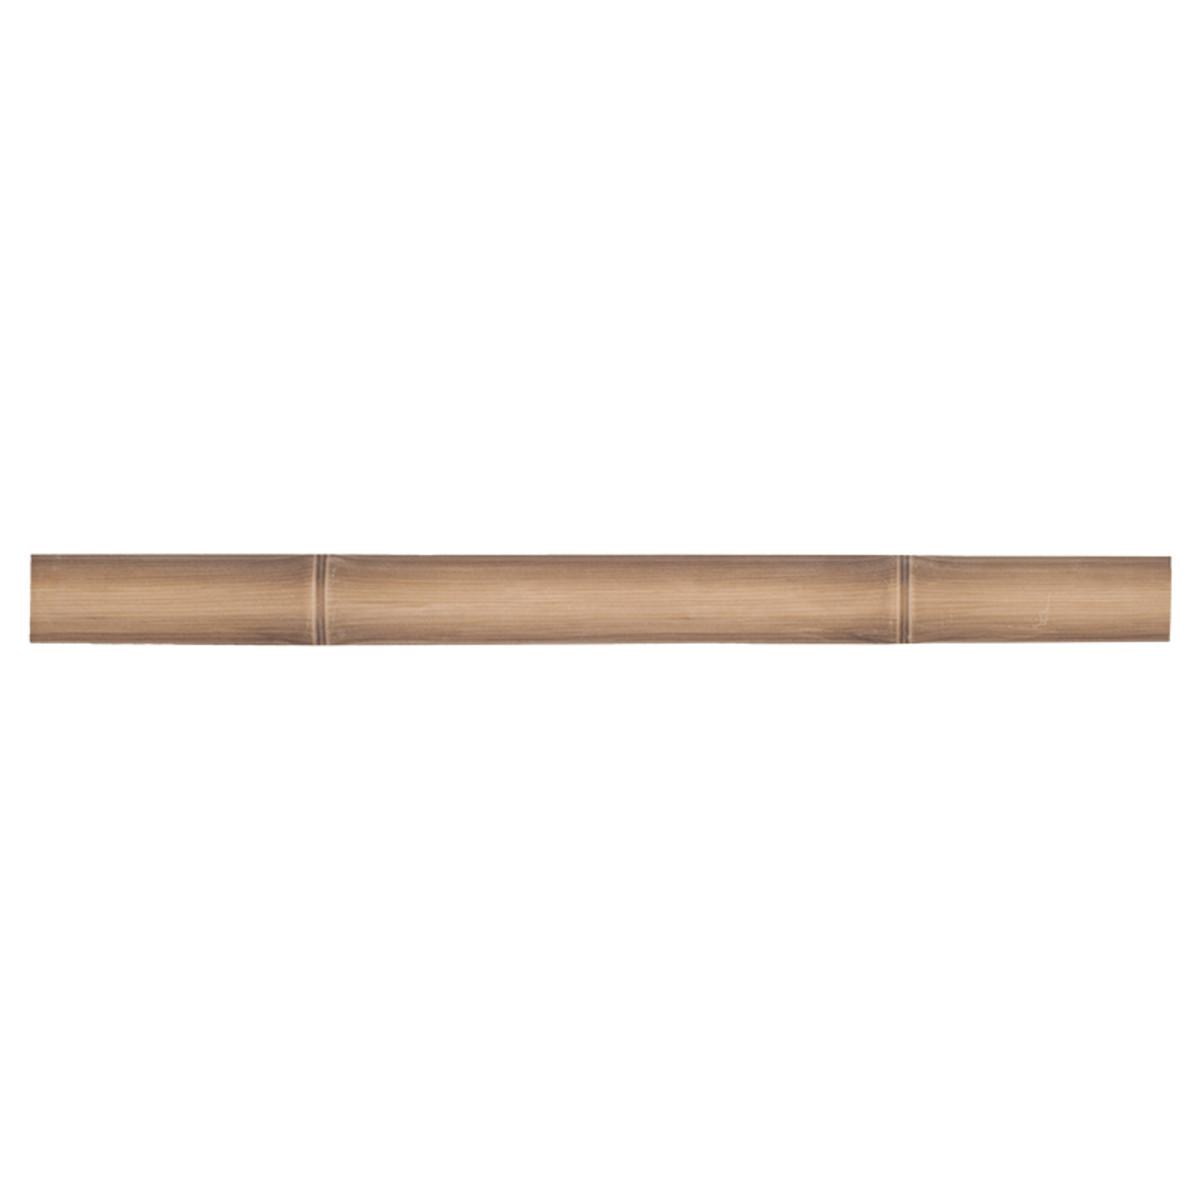 Бордюр Bamboo цвет коричневый 40х3 см